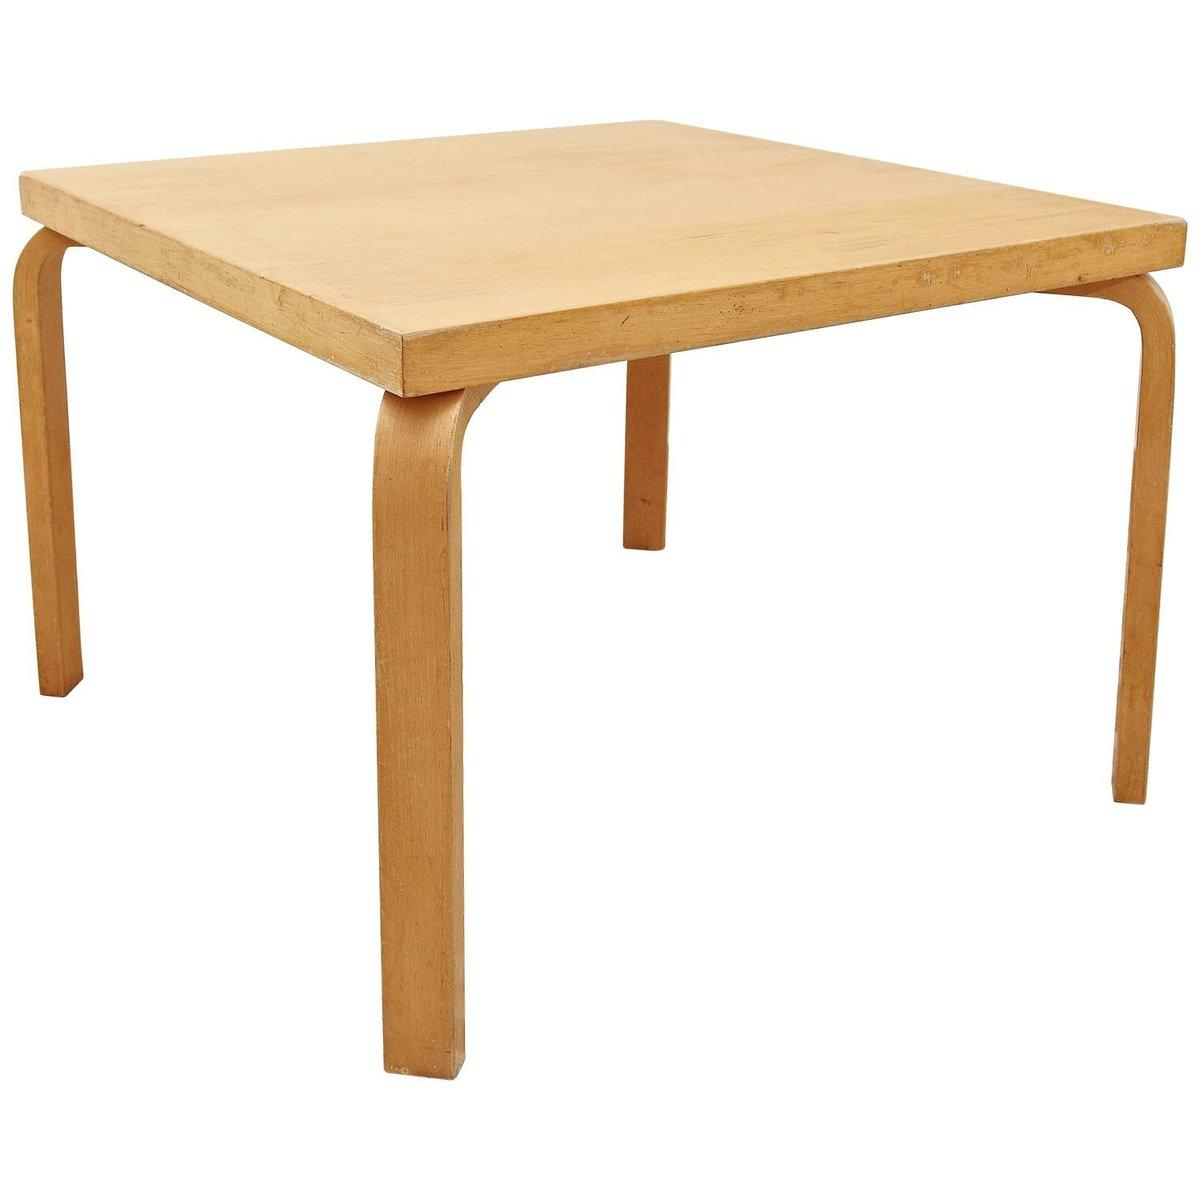 finnish dining table by alvar aalto for artek 1960s for sale at pamono. Black Bedroom Furniture Sets. Home Design Ideas